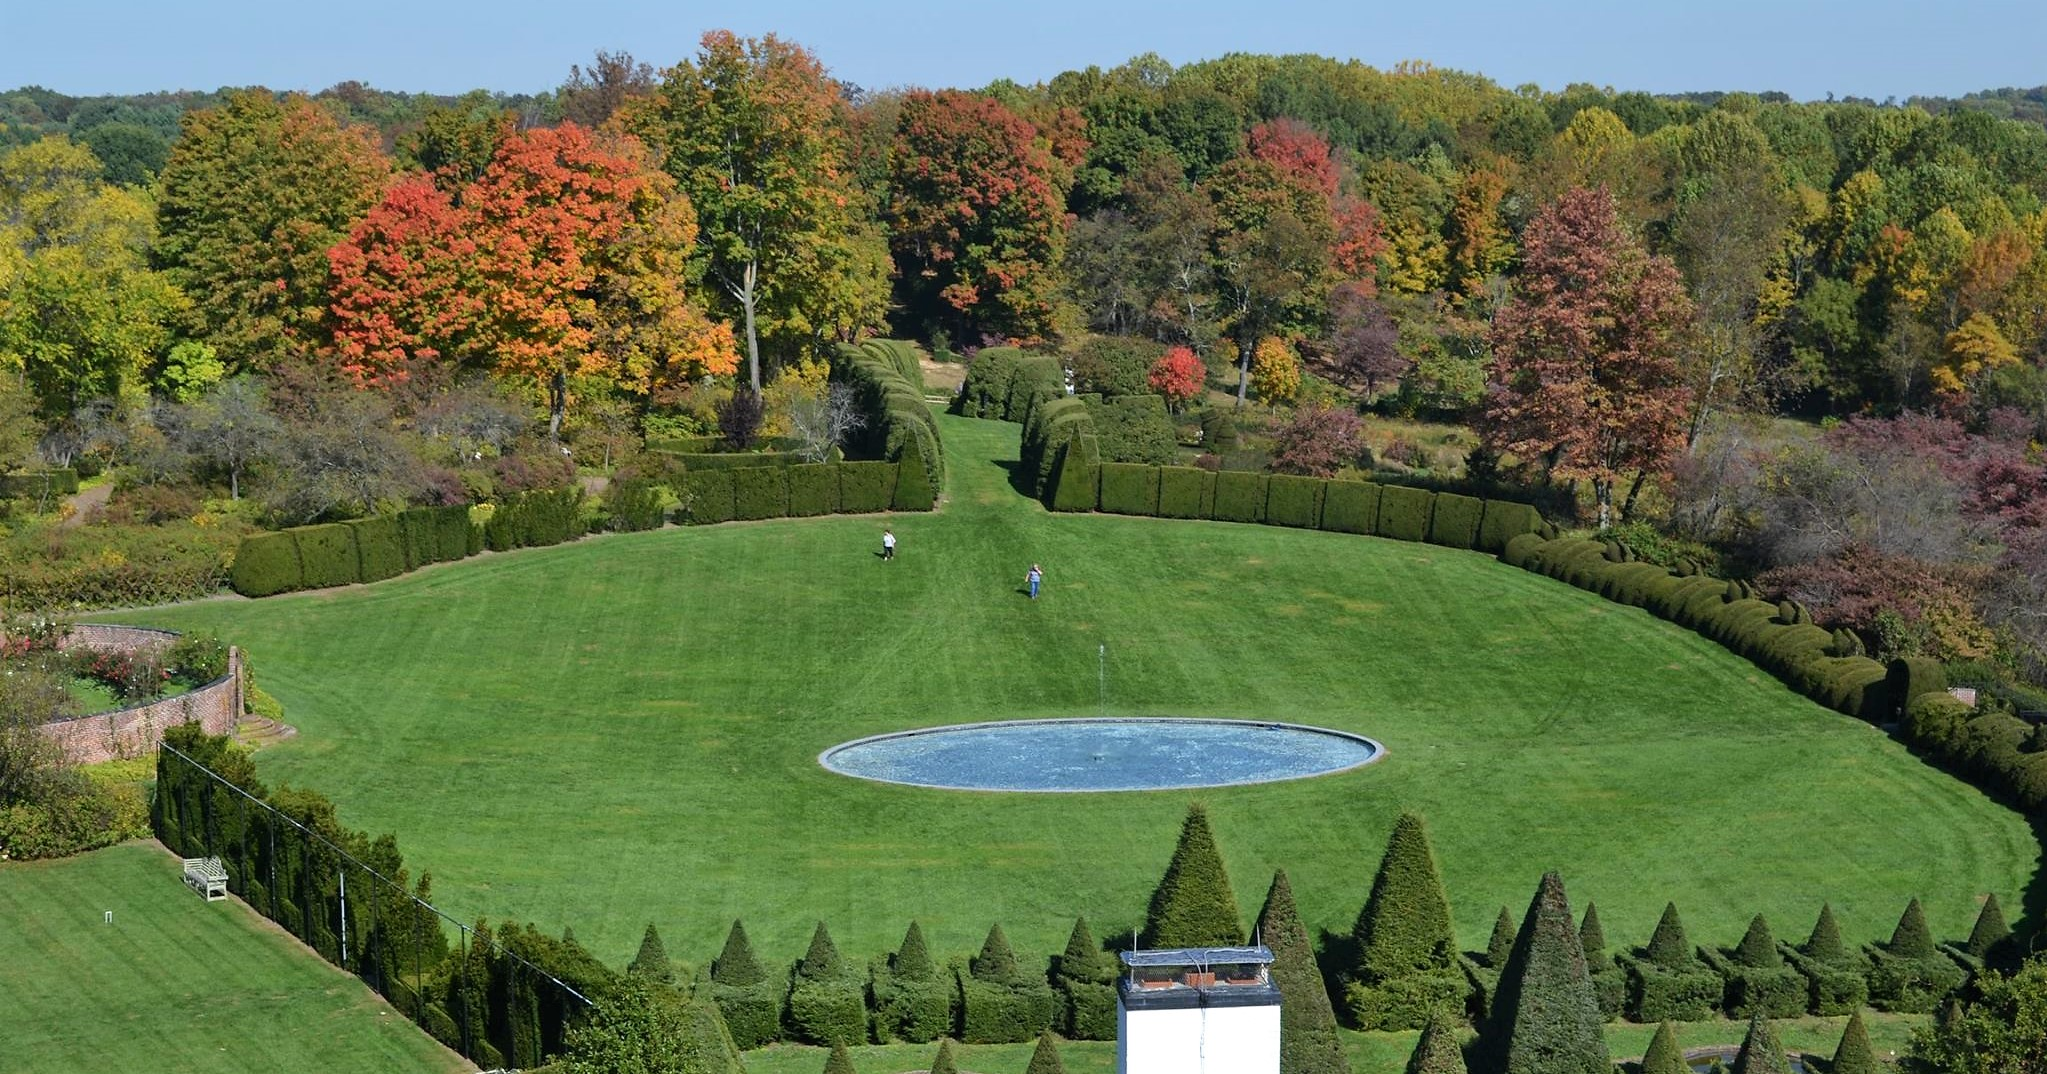 Ladew Topiary Gardens Near Baltimore Looks Like Narnia